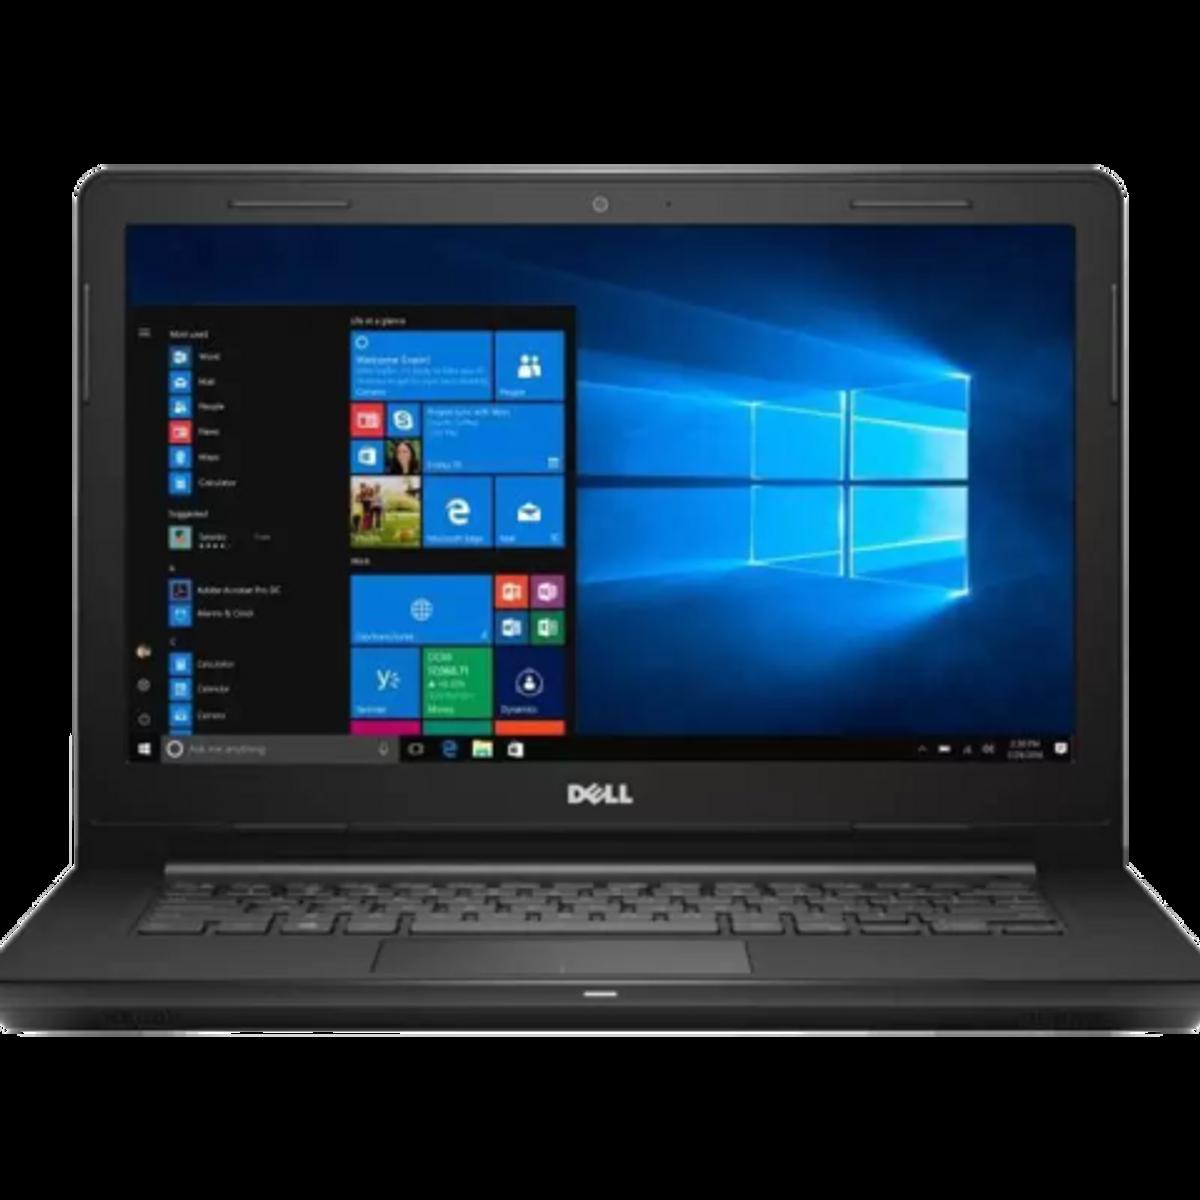 Dell Inspiron 14 3000 Core i3 6th Gen - (4 GB/1 TB HDD/Windows 10 Home) 3467 Laptop (14 inch)